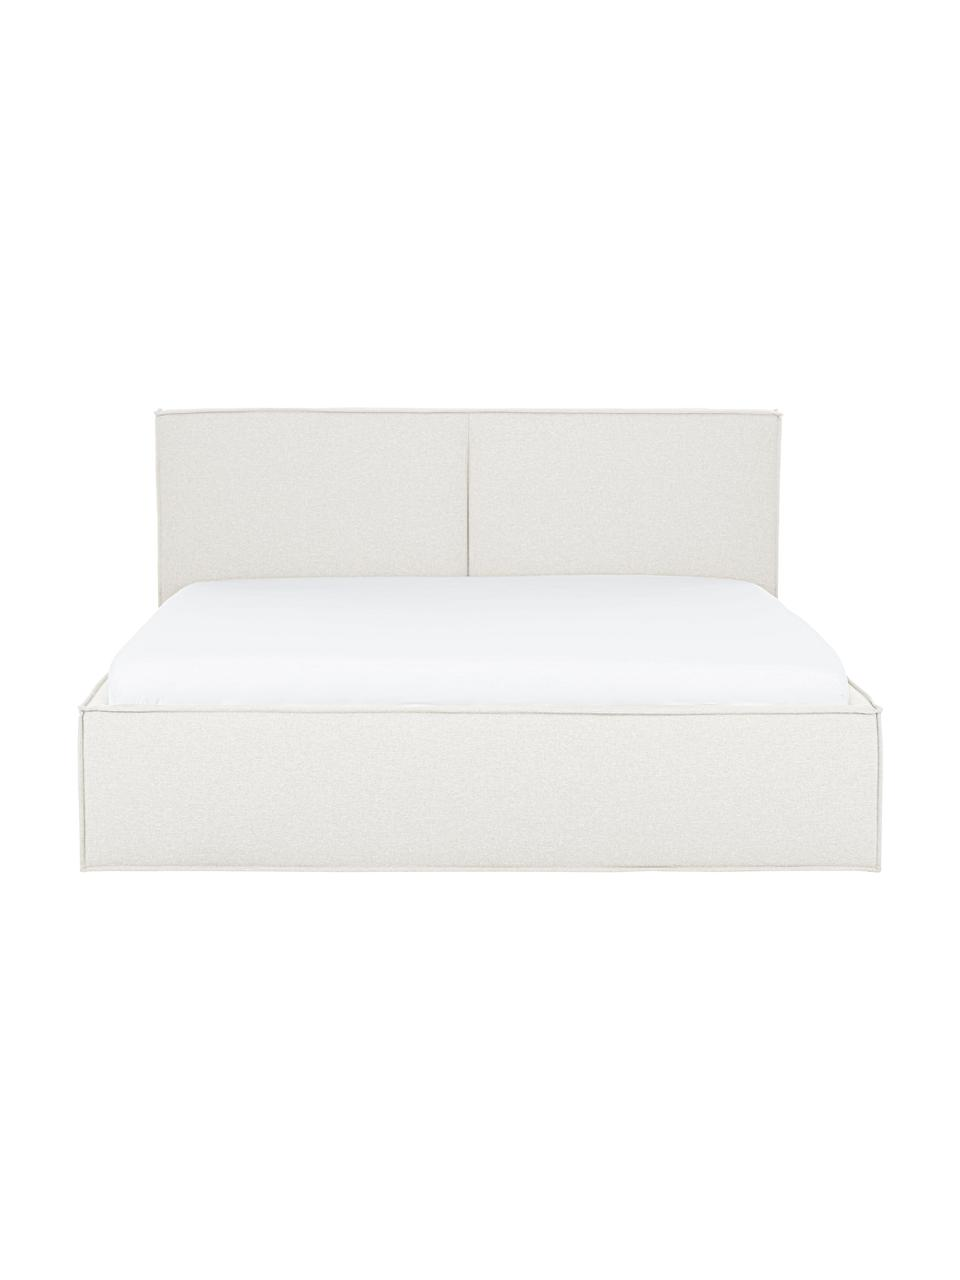 Gestoffeerd bed Dream met opbergruimte in crèmewit, Frame: massief grenenhout en pla, Bekleding: polyester (gestructureerd, Geweven stof crèmewit, 180 x 200 cm